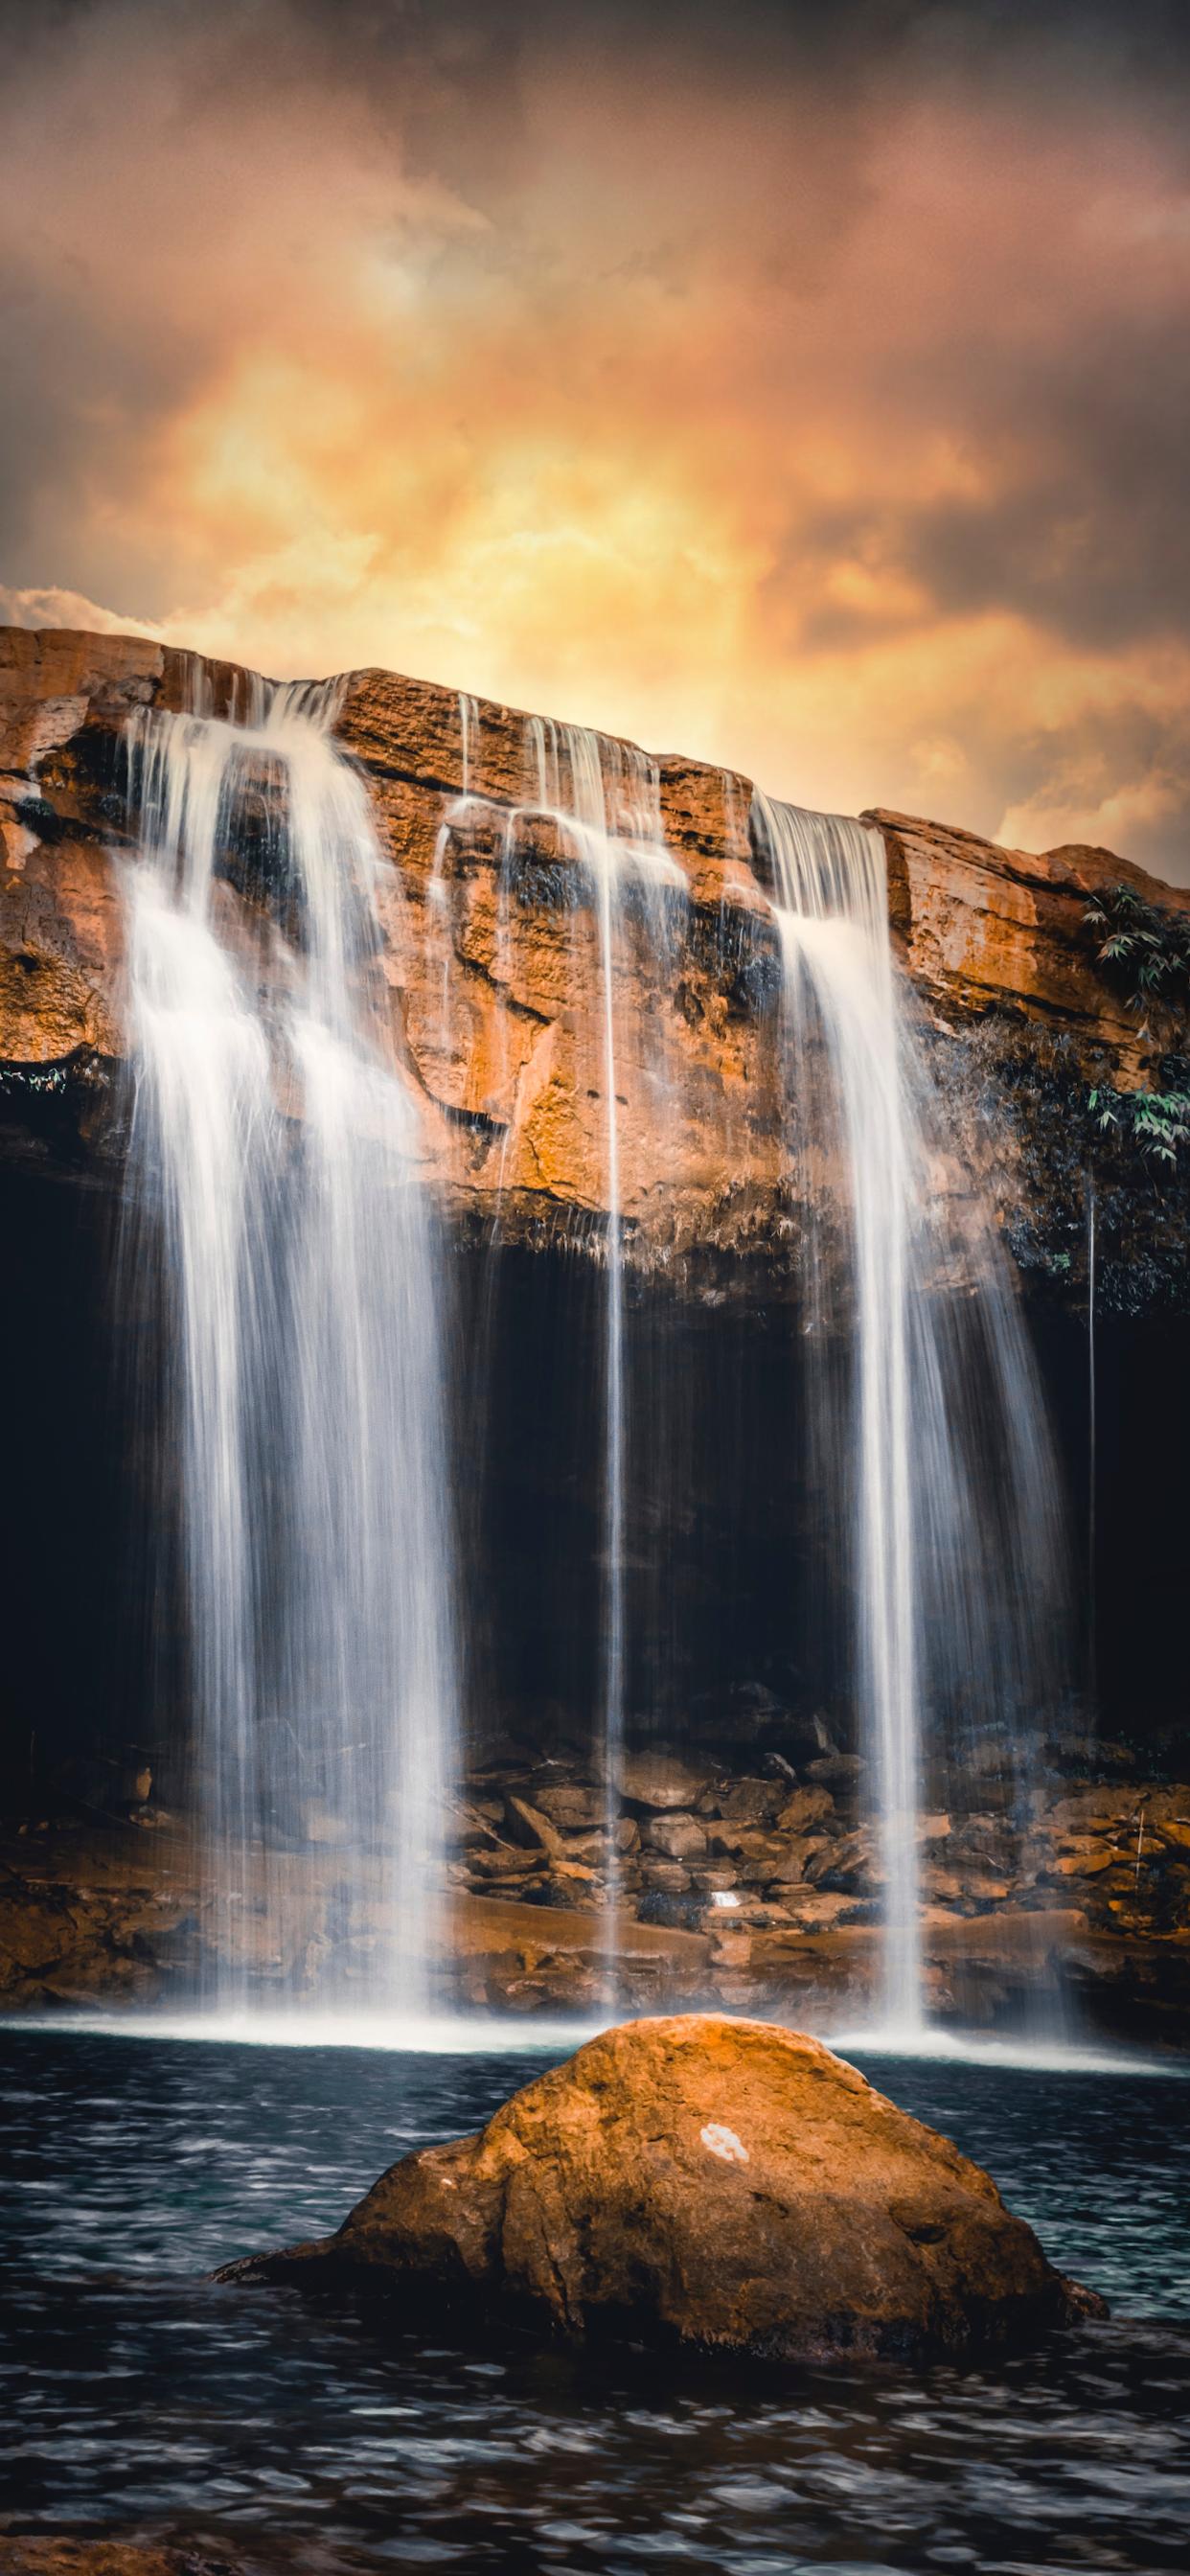 iPhone wallpapers waterfall guwahati india Fonds d'écran iPhone du 07/04/2020